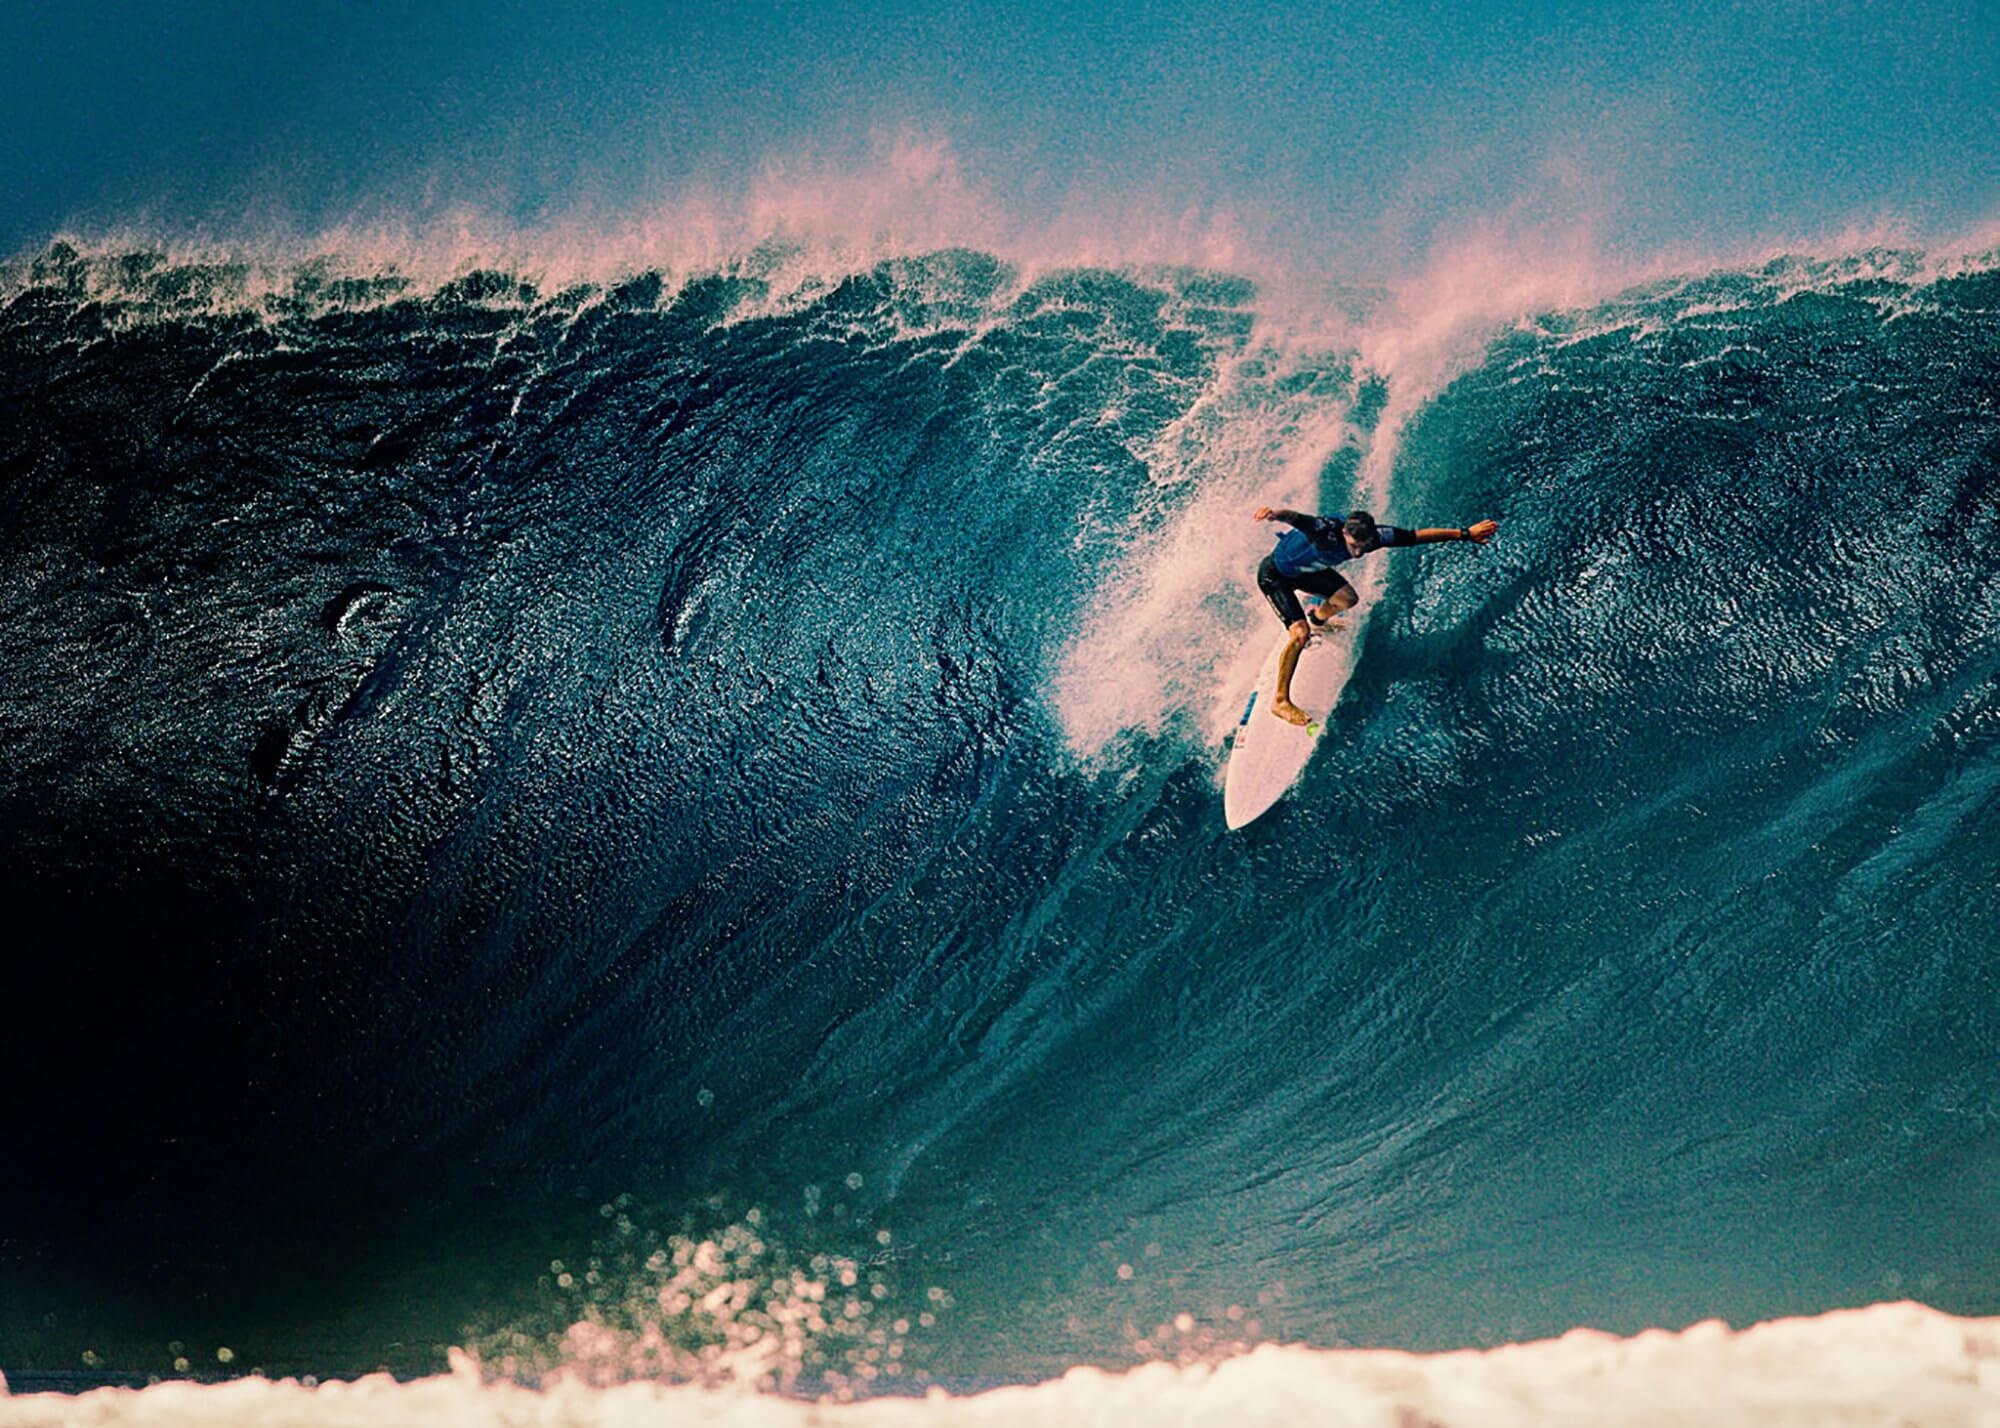 Man riding down big wave